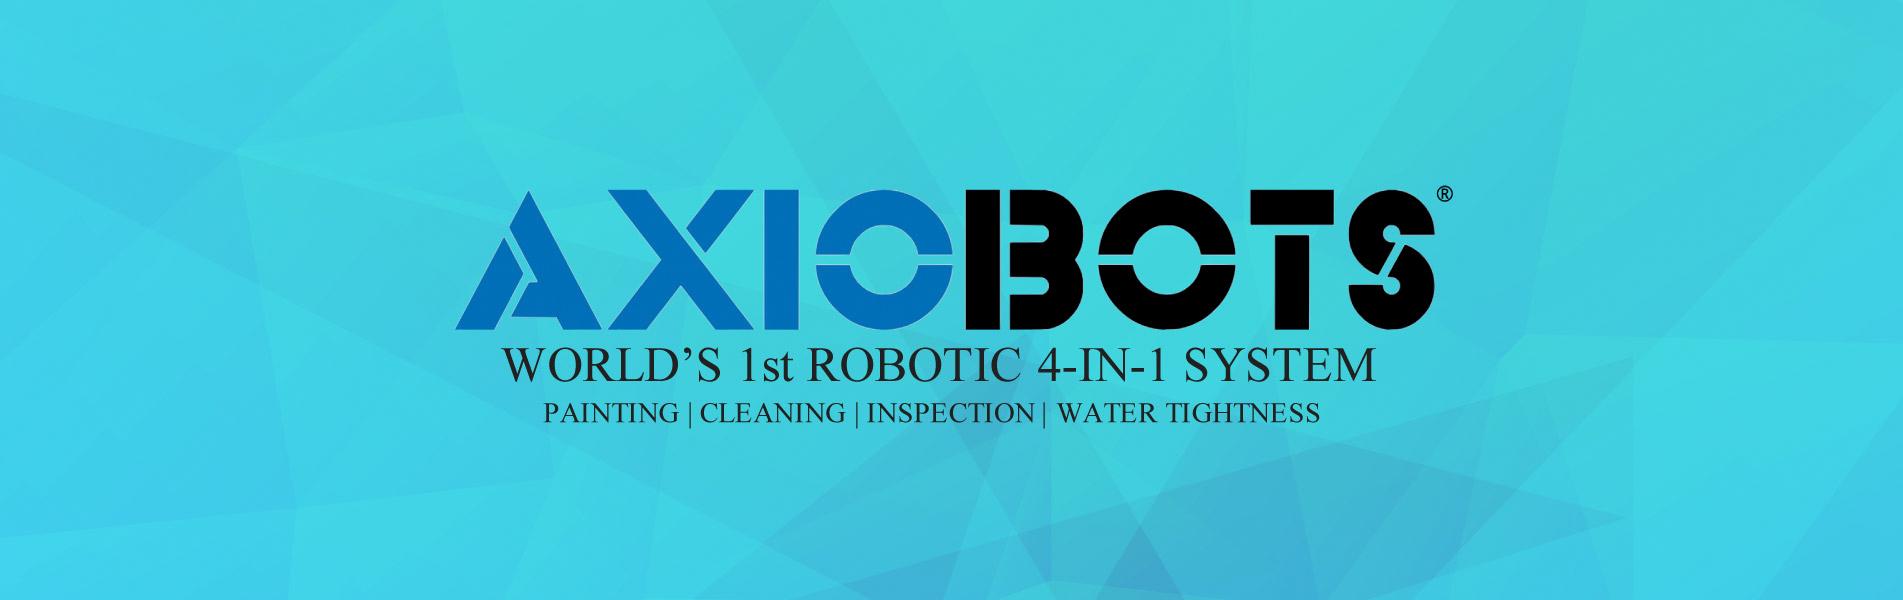 axio-bots-02